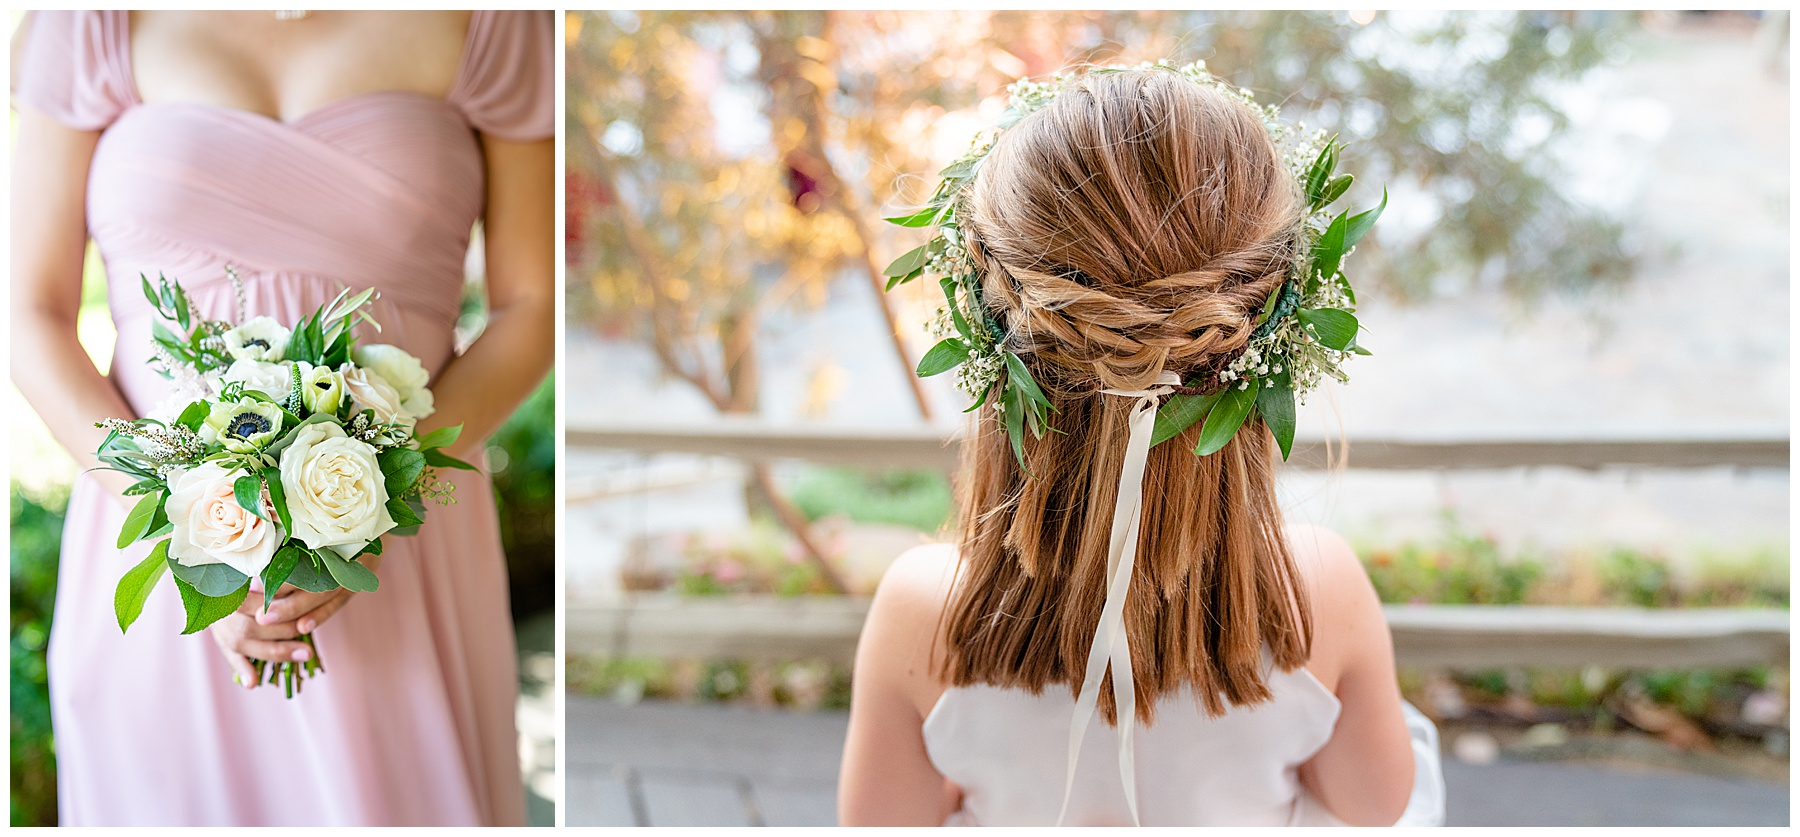 flower girl hair crown